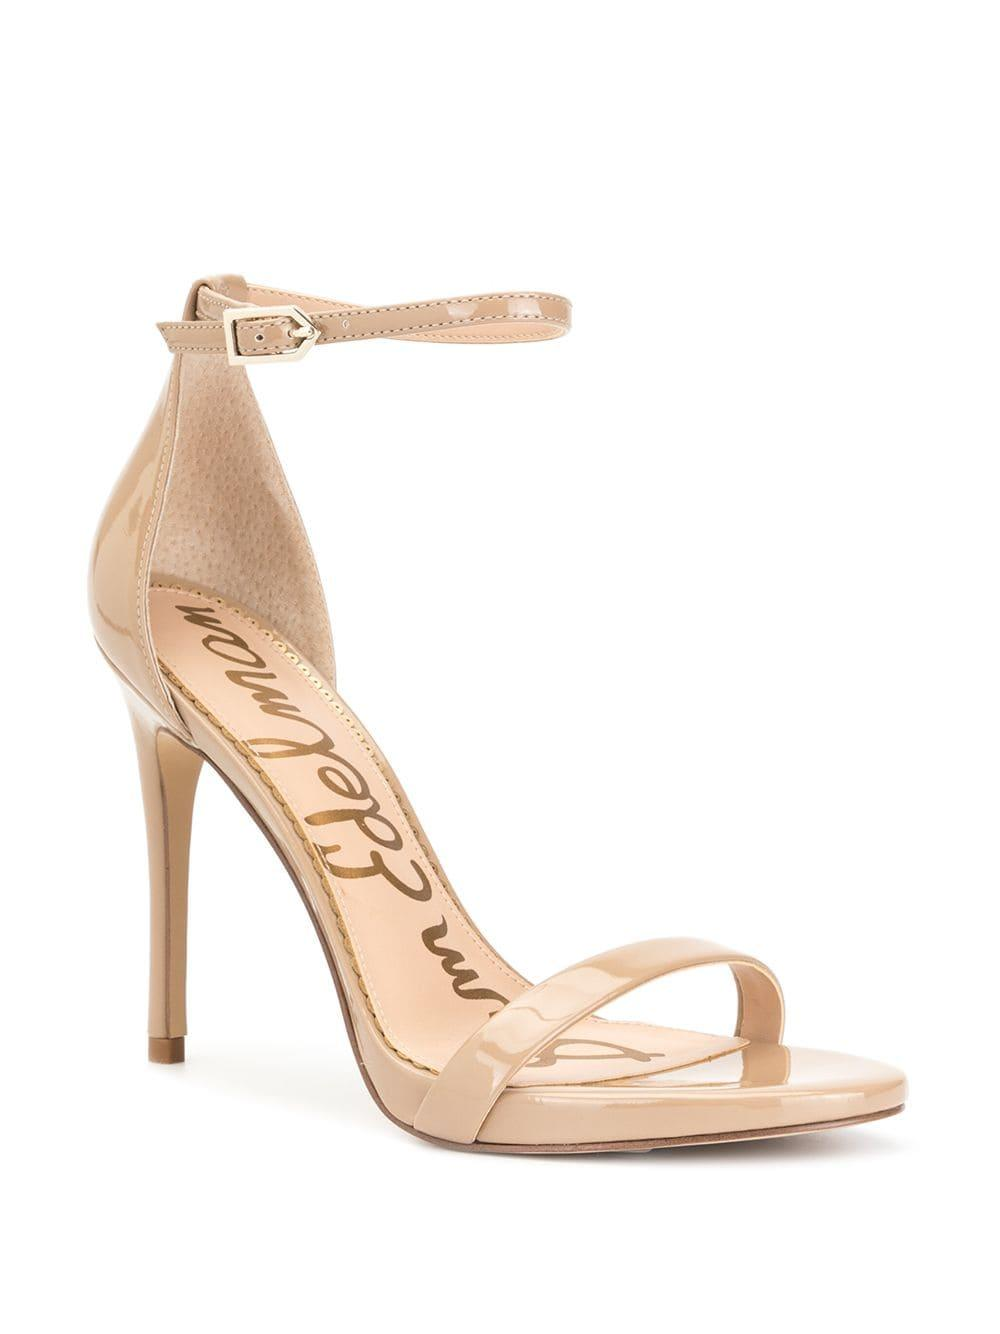 cb4650be93f1 Lyst - Sam Edelman Ariella Patent Heeled Sandals in Brown